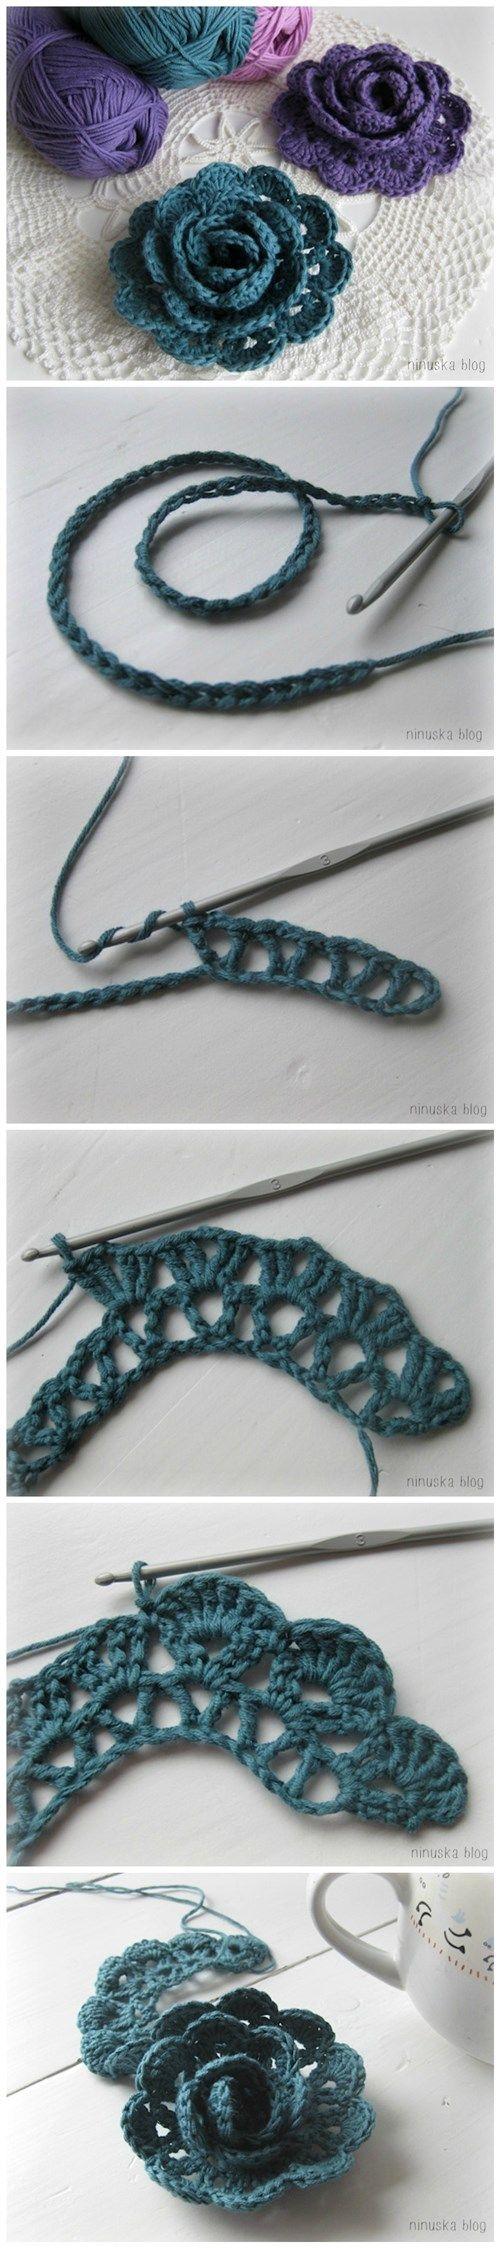 patron flor crochet-otakulandia.es (2)